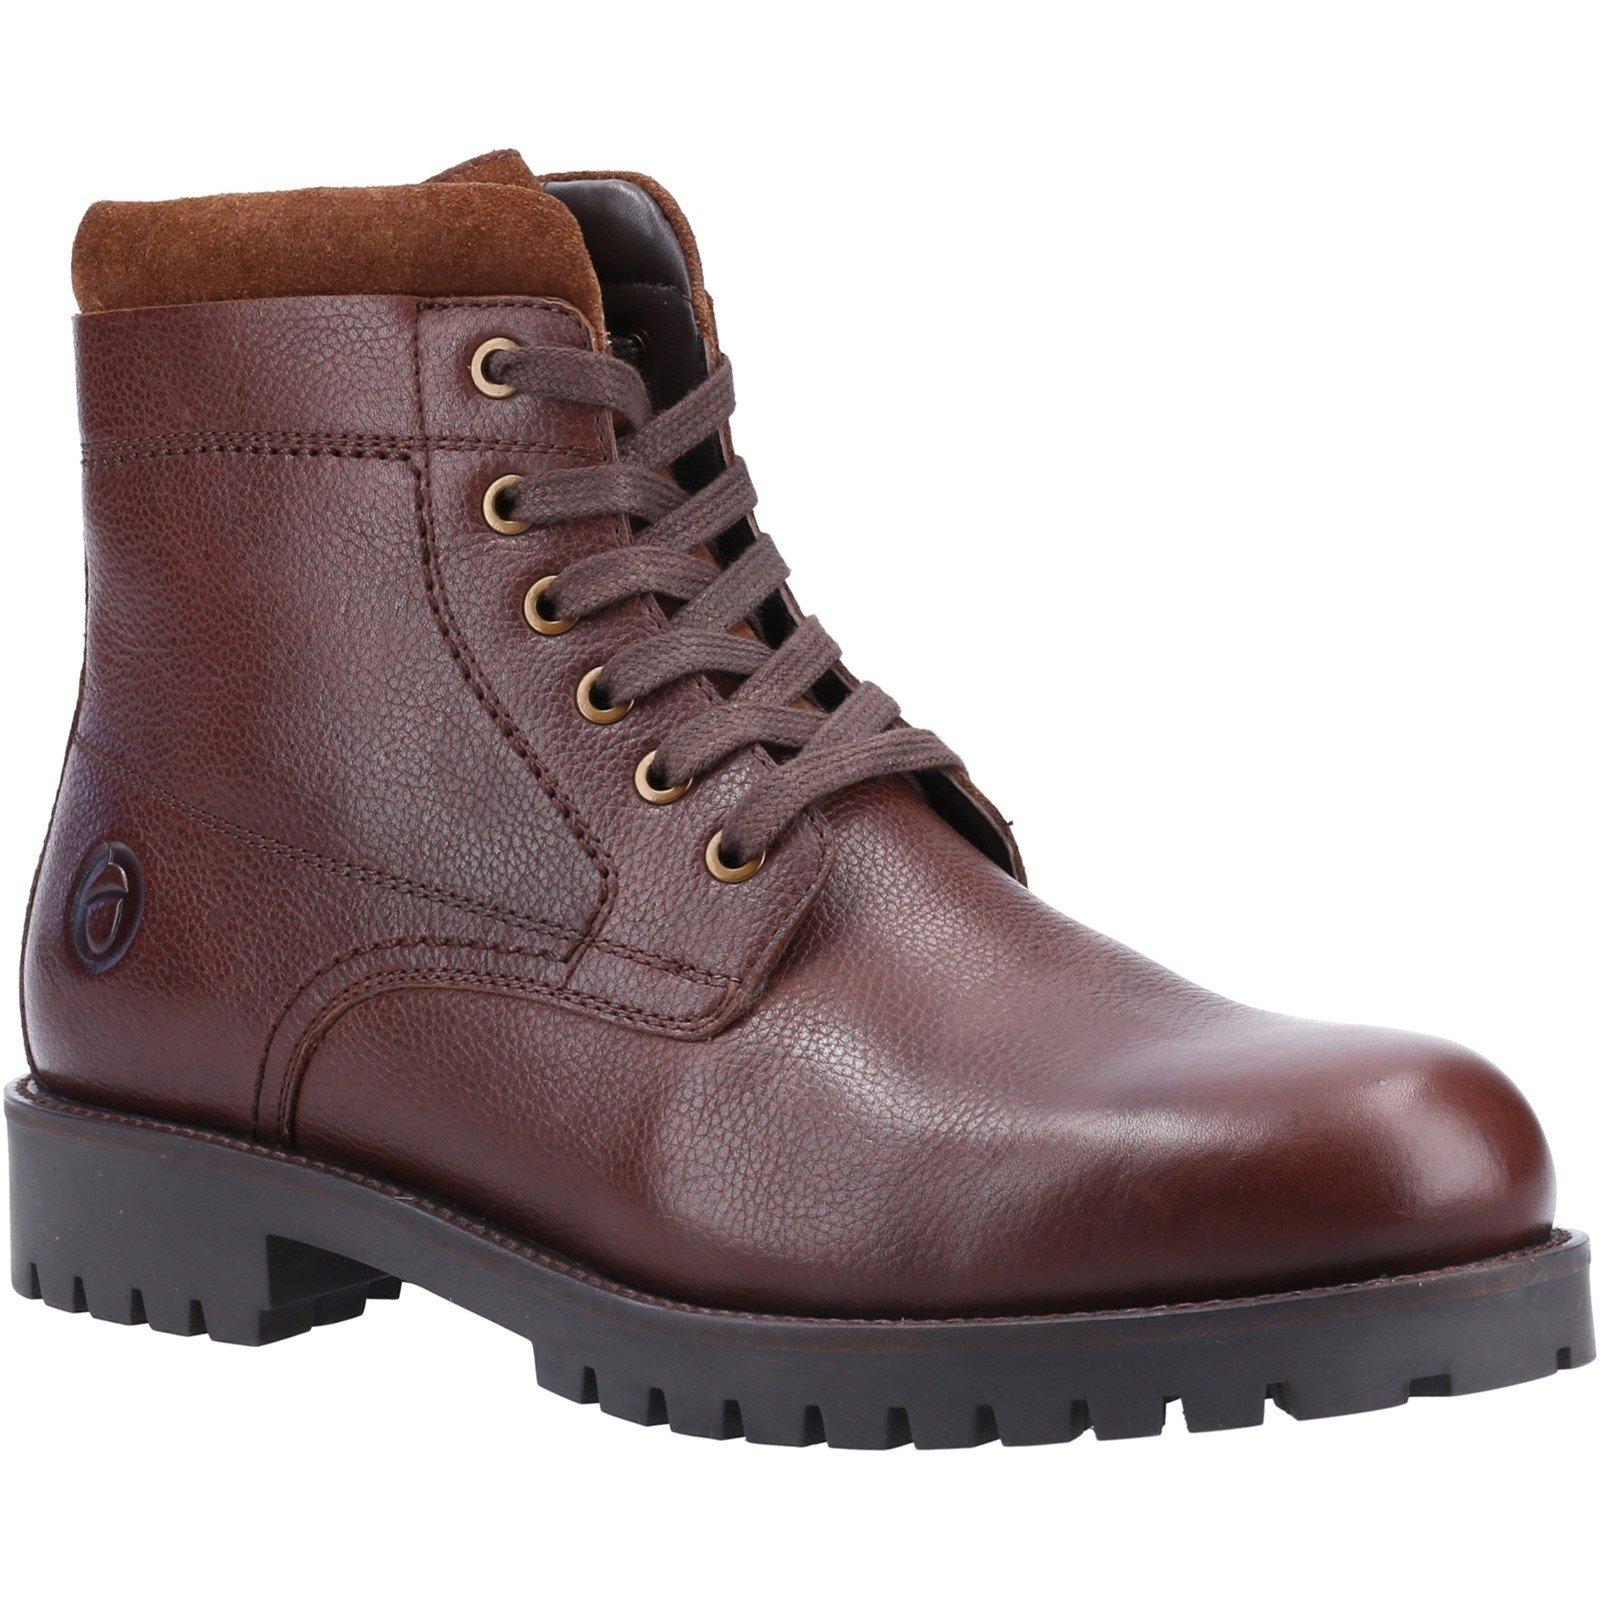 Cotswold Men's Thorsbury Lace Up Shoe Boot Various Colours 32963 - Brown 6